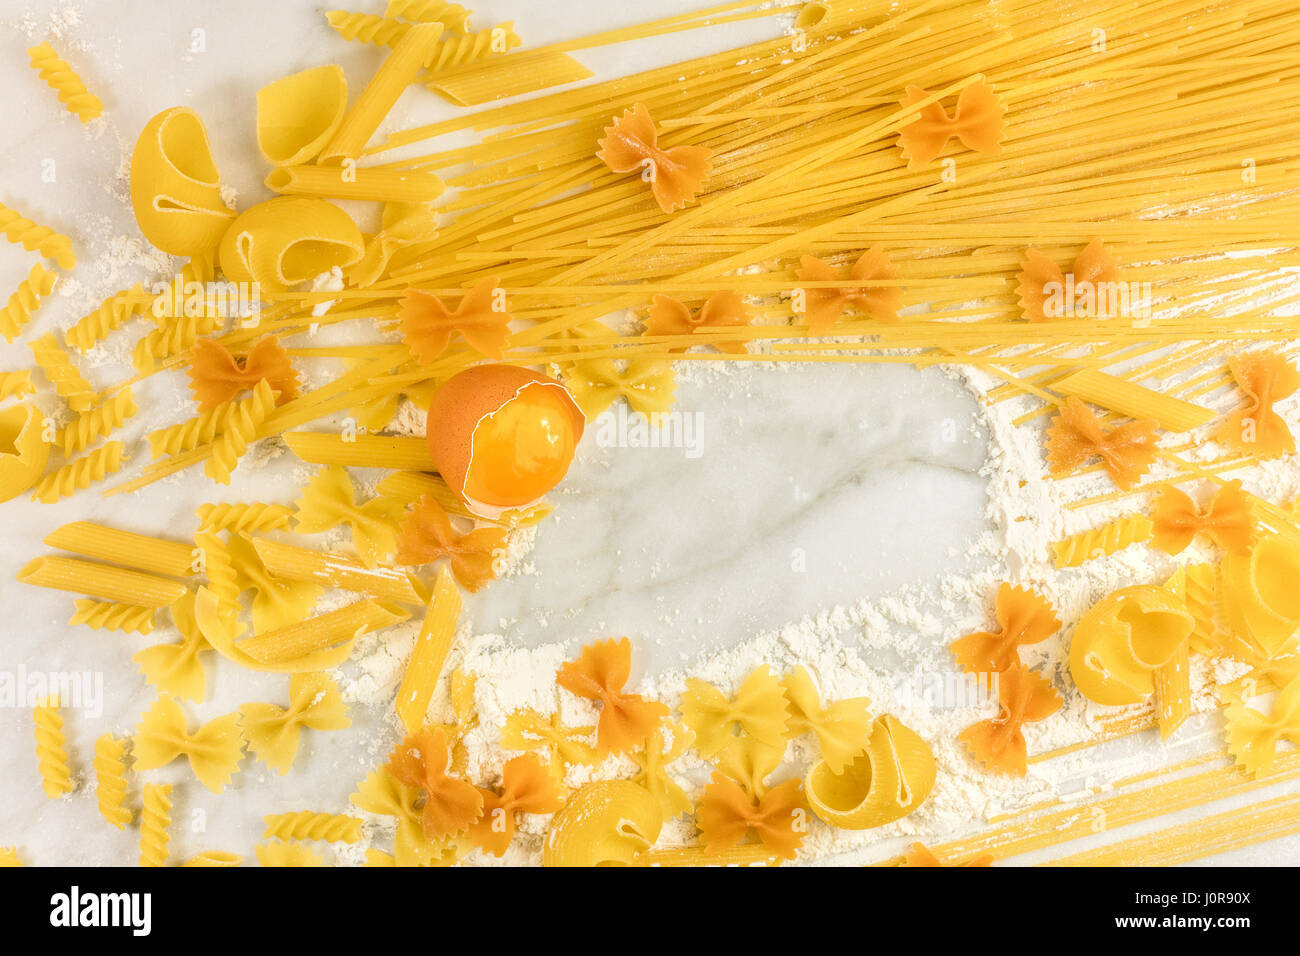 Forms Pasta Stockfotos & Forms Pasta Bilder - Seite 2 - Alamy